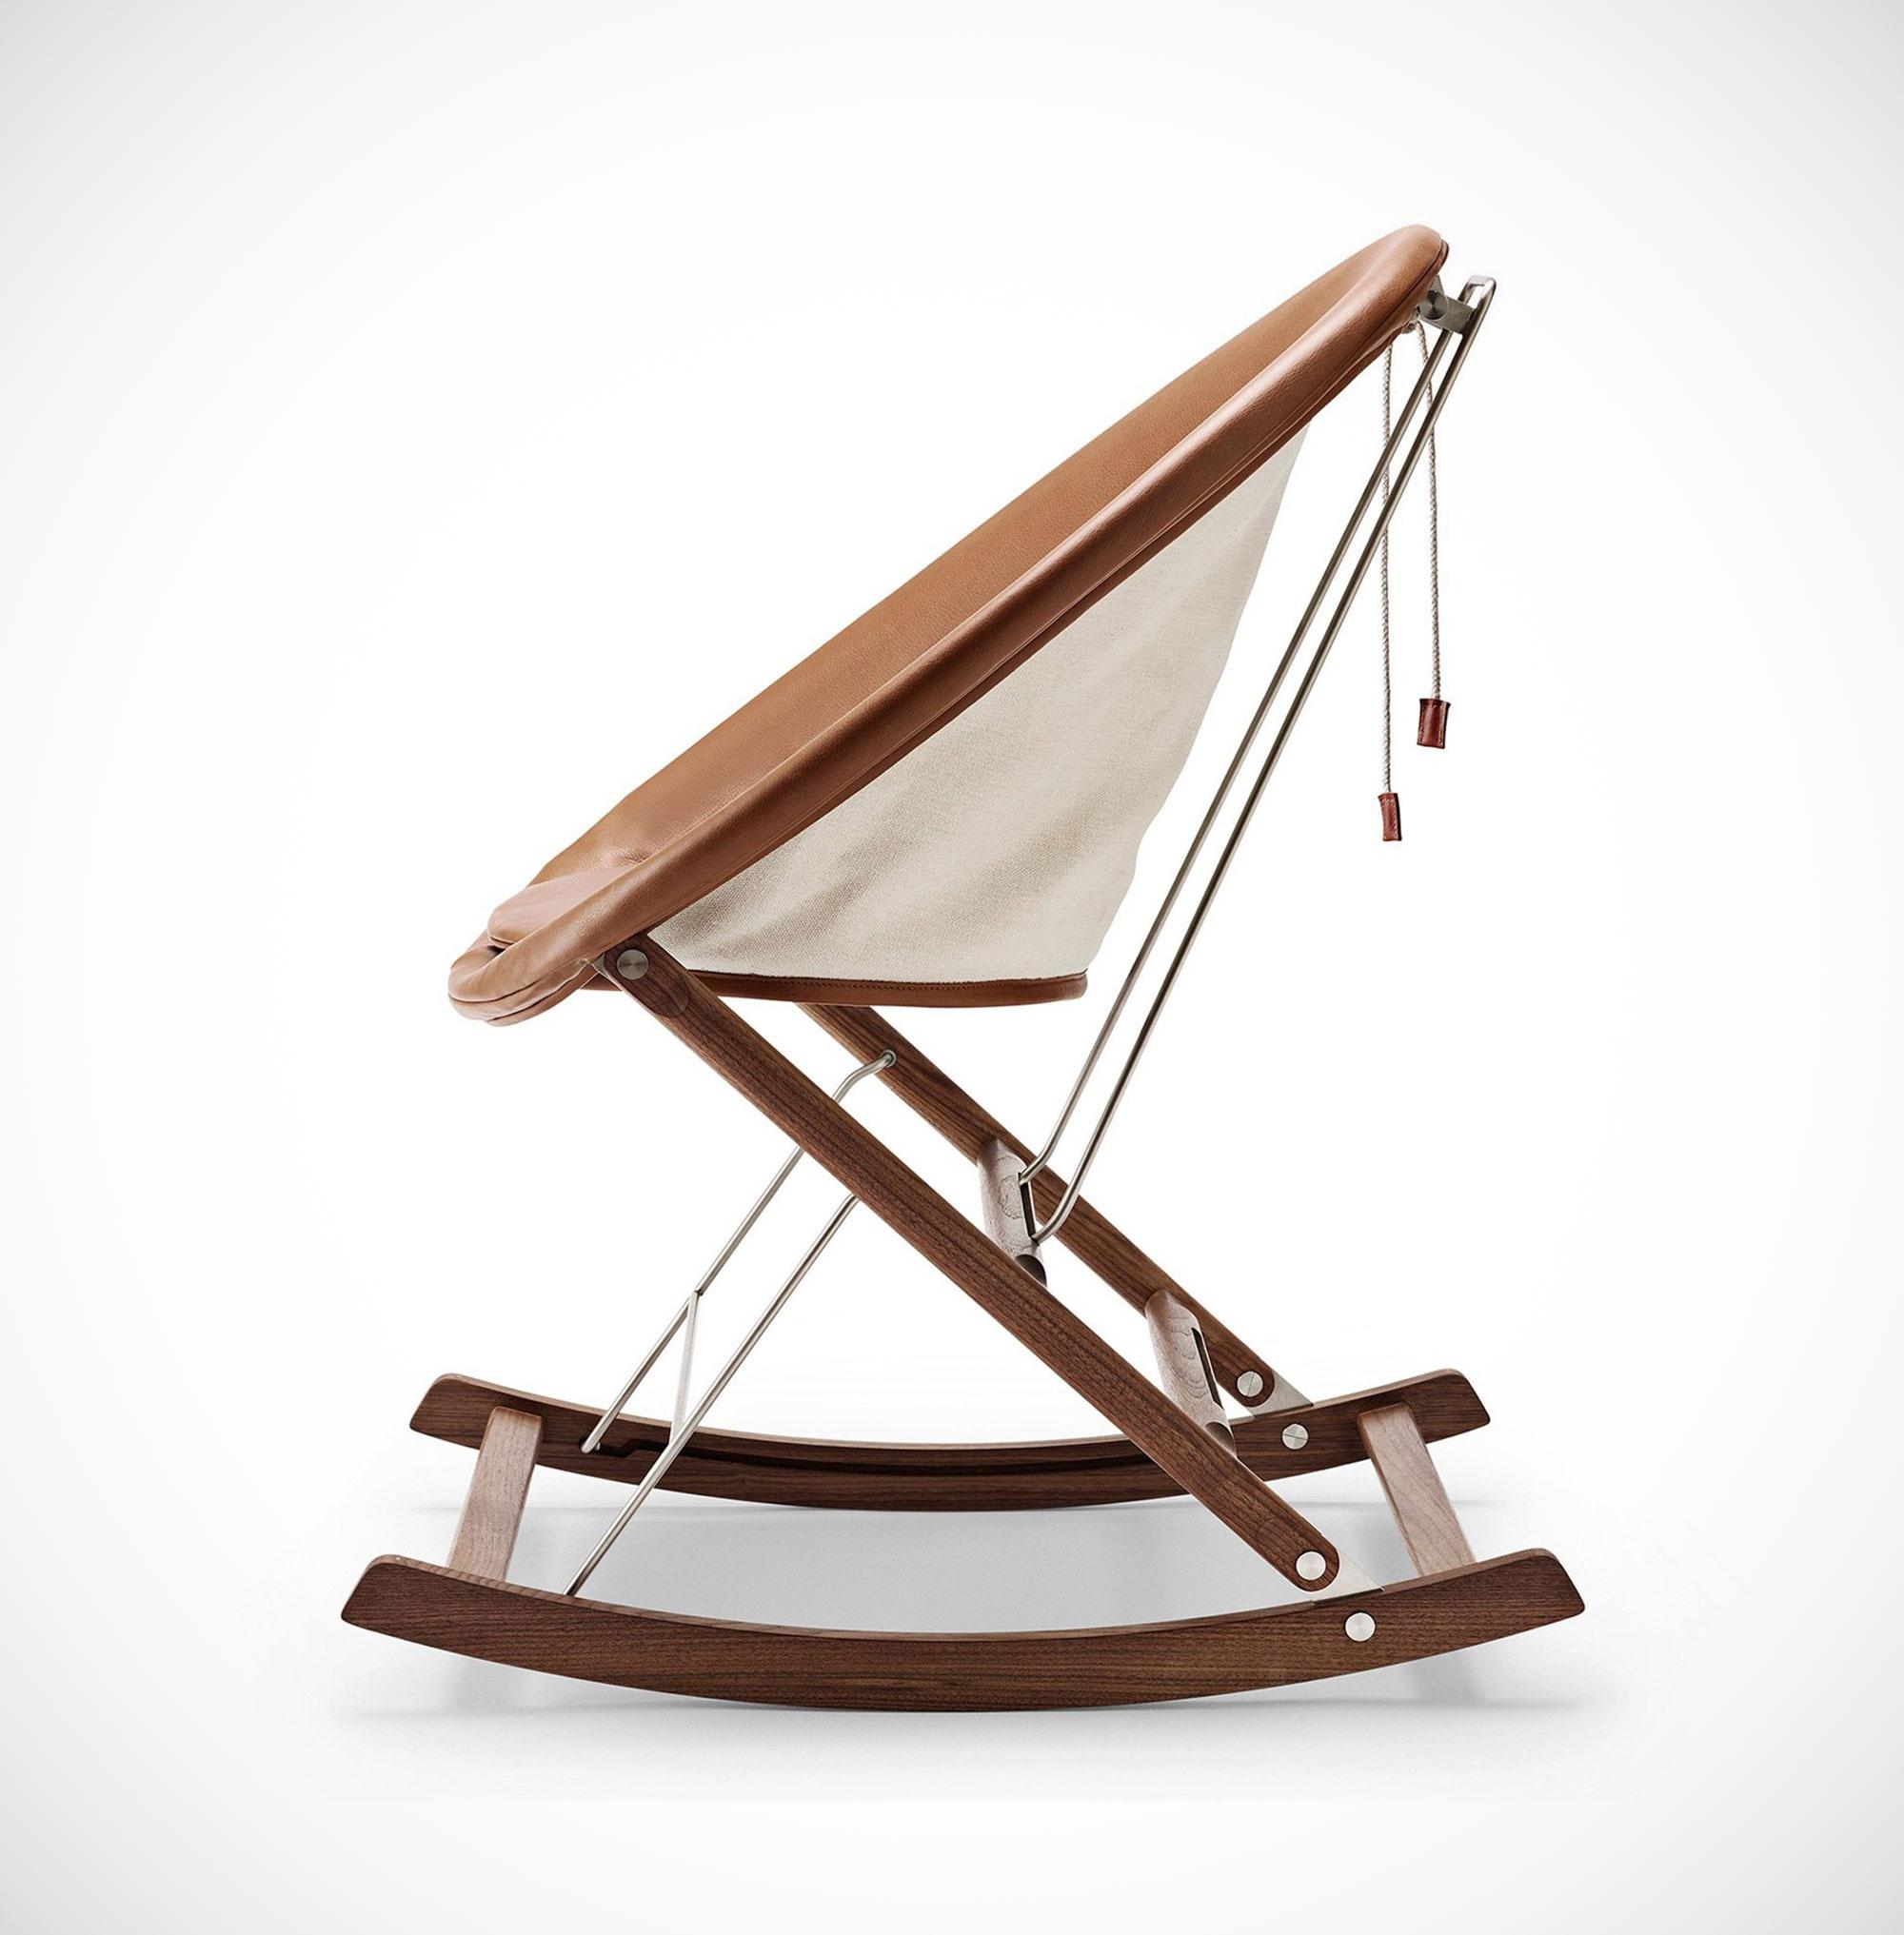 rocking-chair-anker-bak-carl-hansen-gessato-7